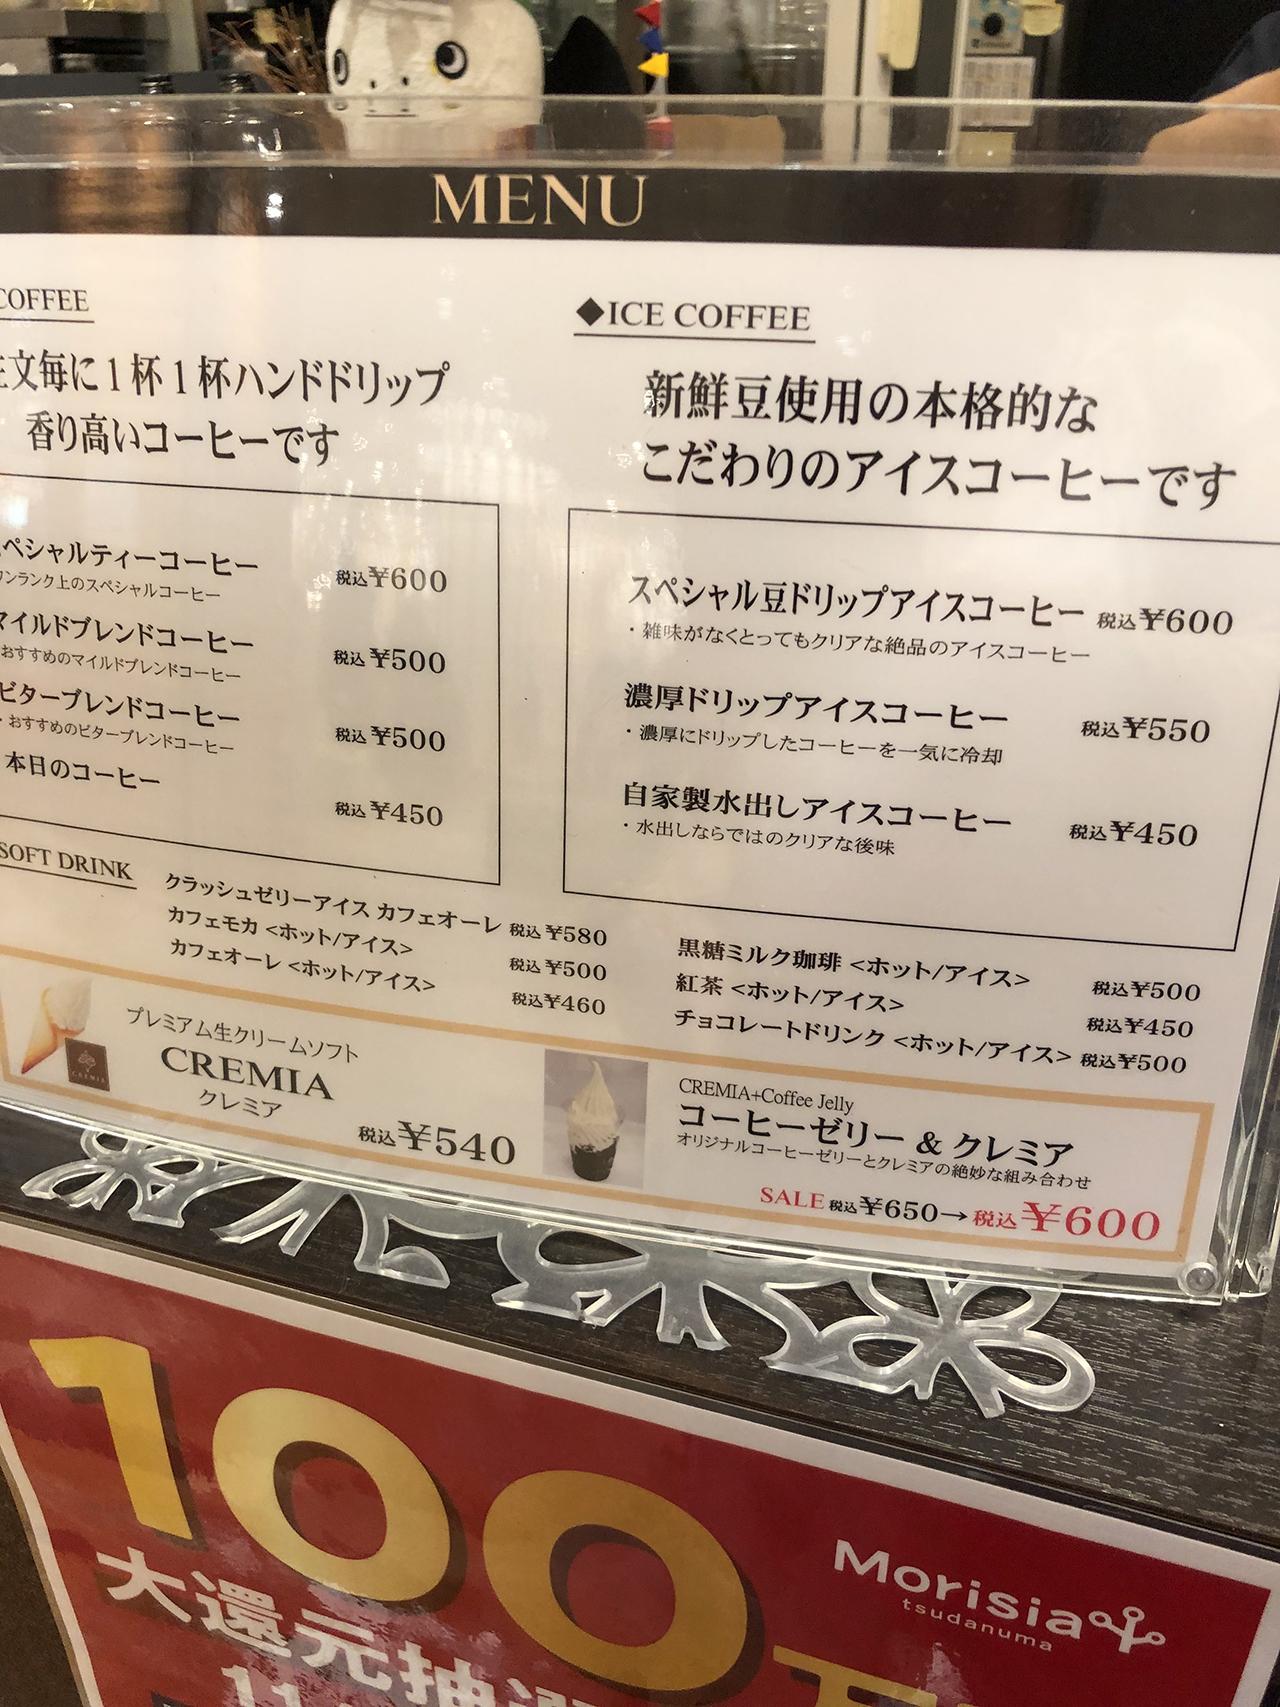 CAMBLEM(キャンブレム) グリーン珈琲焙煎所 モリシア津田沼店の投稿写真4